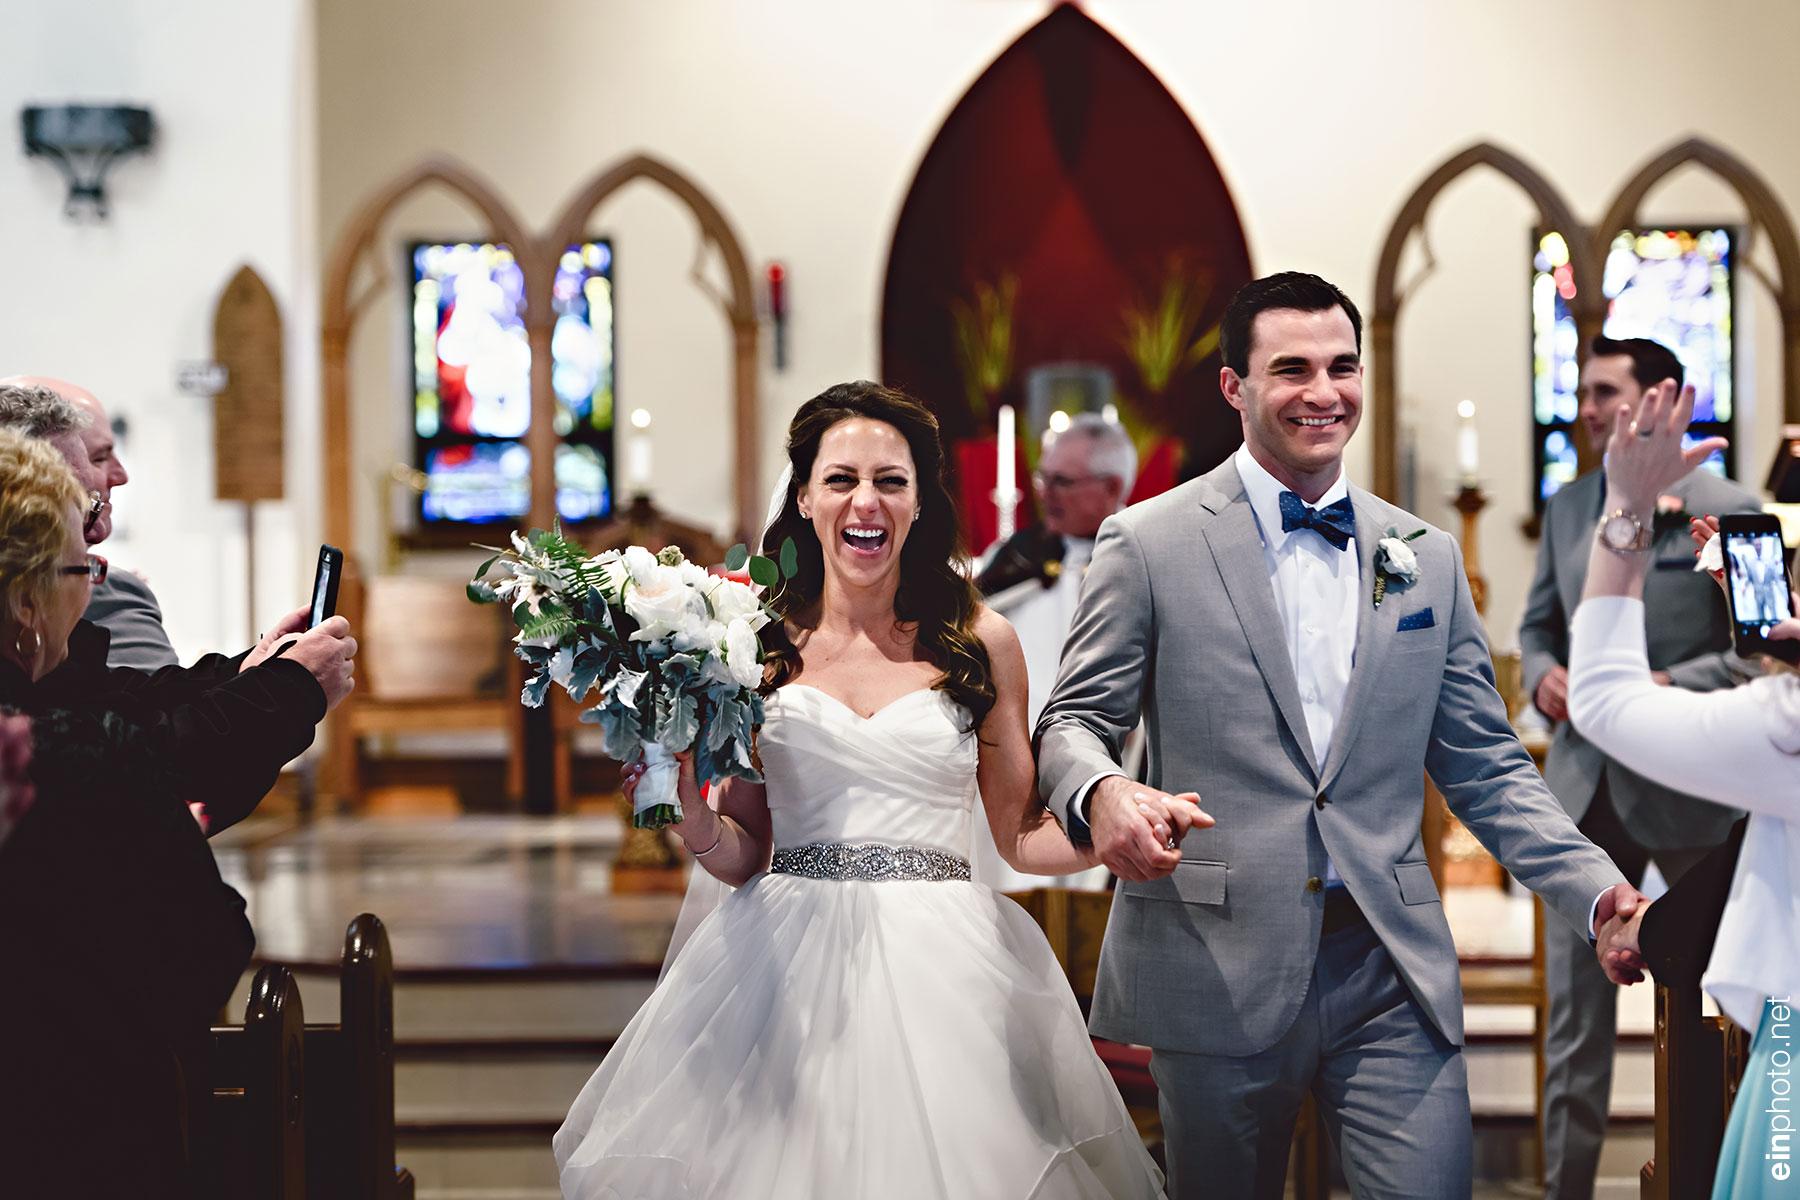 gurneys-montauk-wedding-0027.jpg